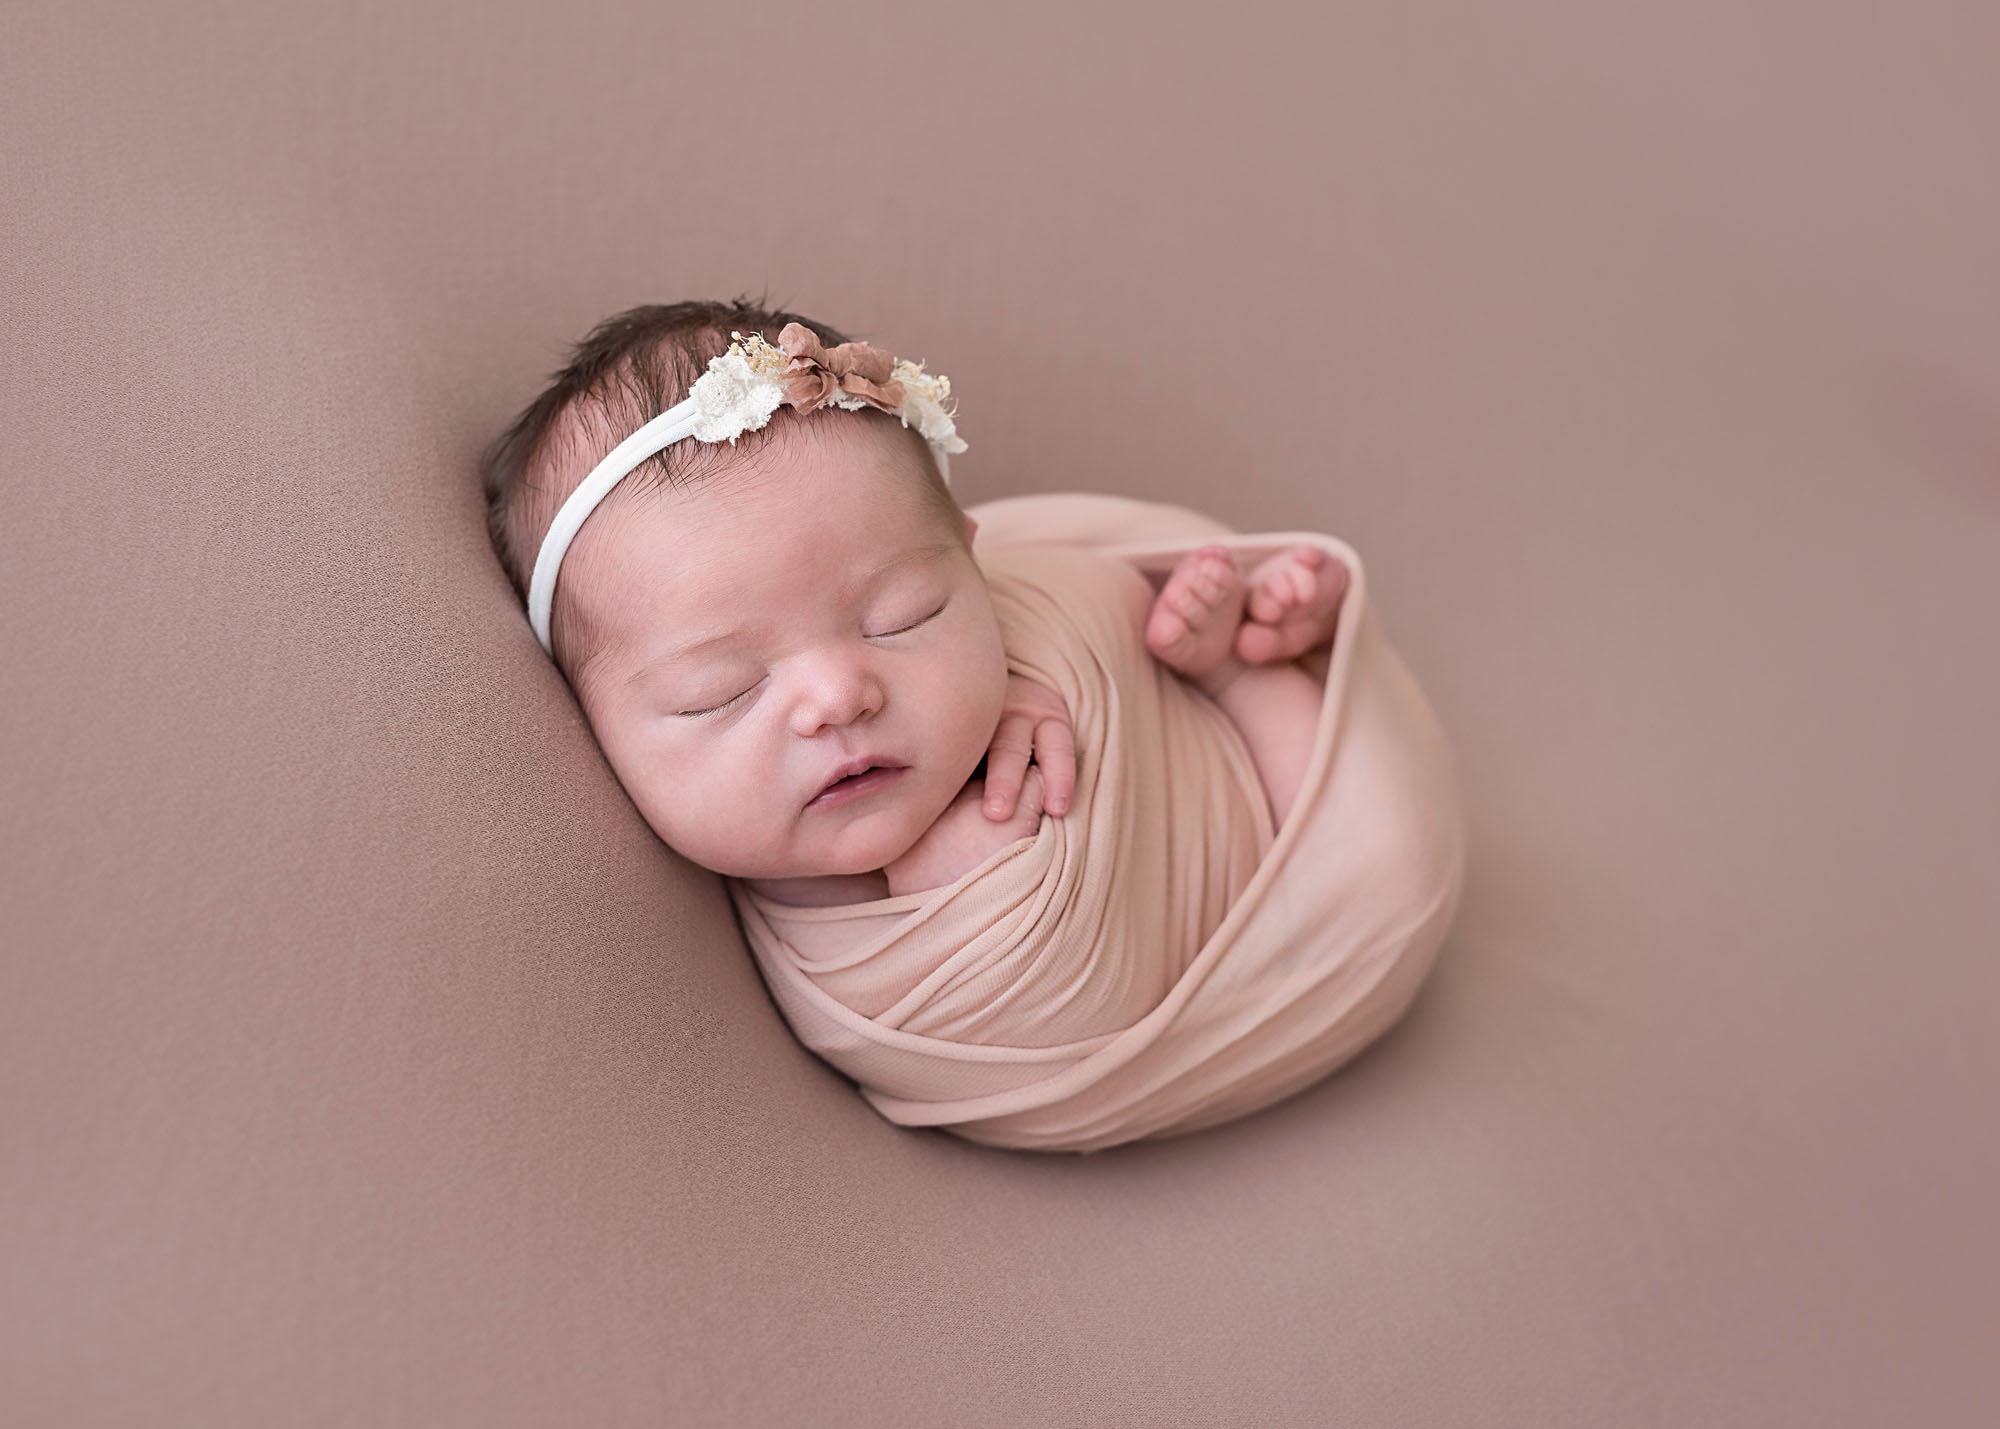 newborn-photography-tory-d-melbourne27.jpg